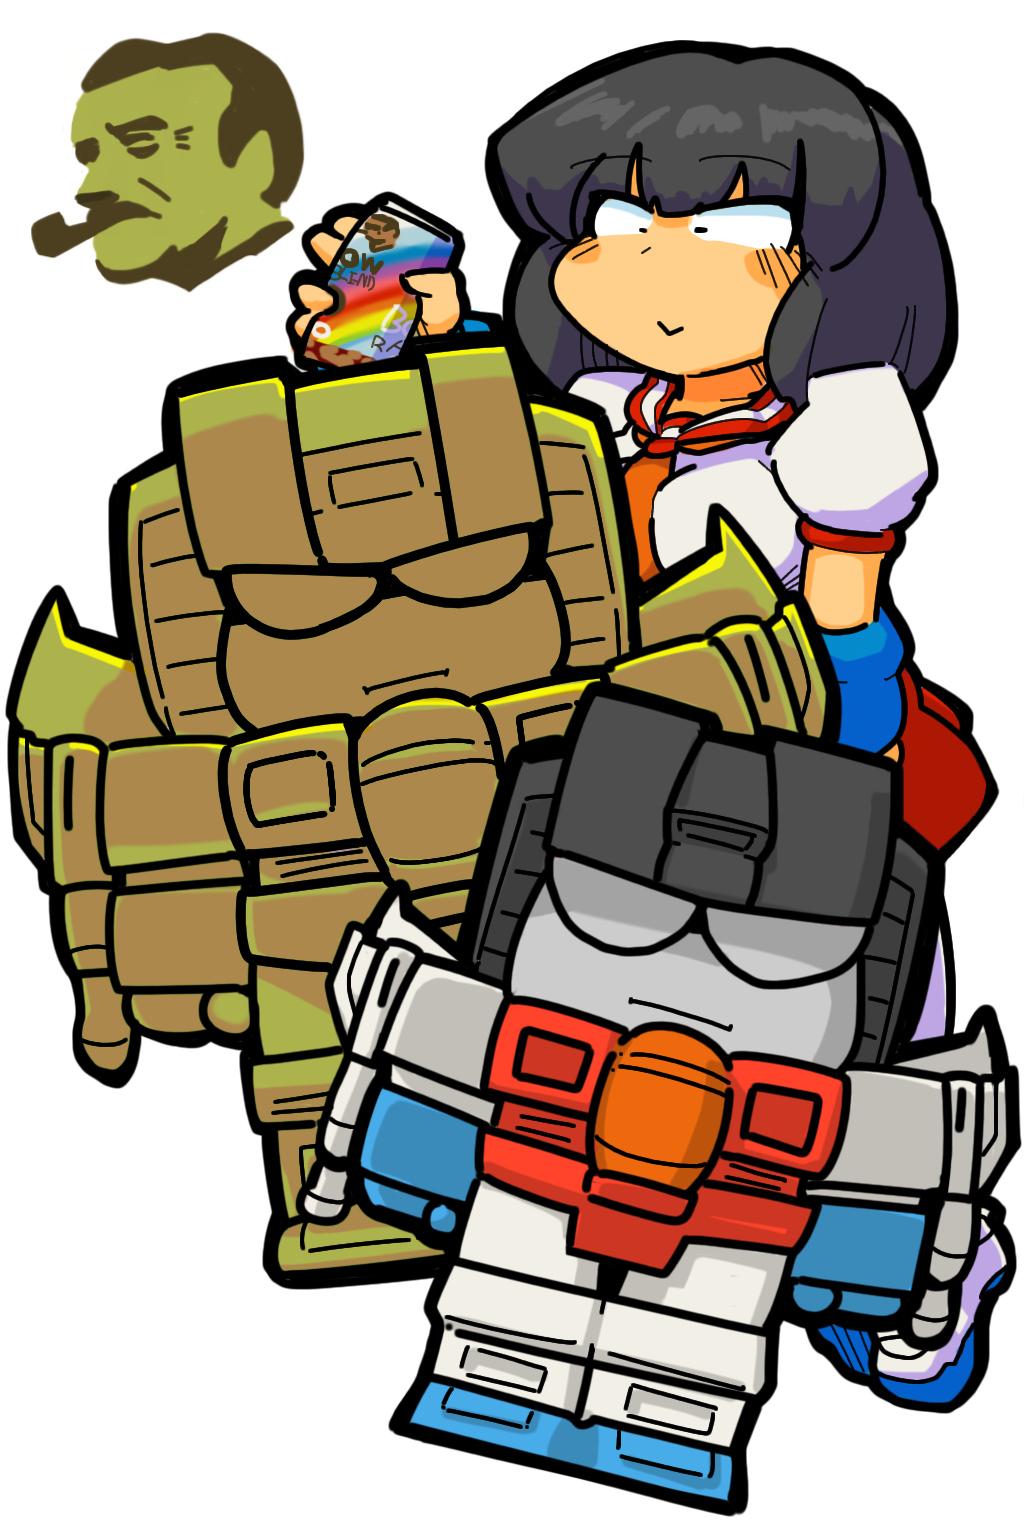 Transformers Generation1 BOSS santory Starscream Pretenders Humanized Gijinka Robot girl Holomatter Avatars schoolgirl